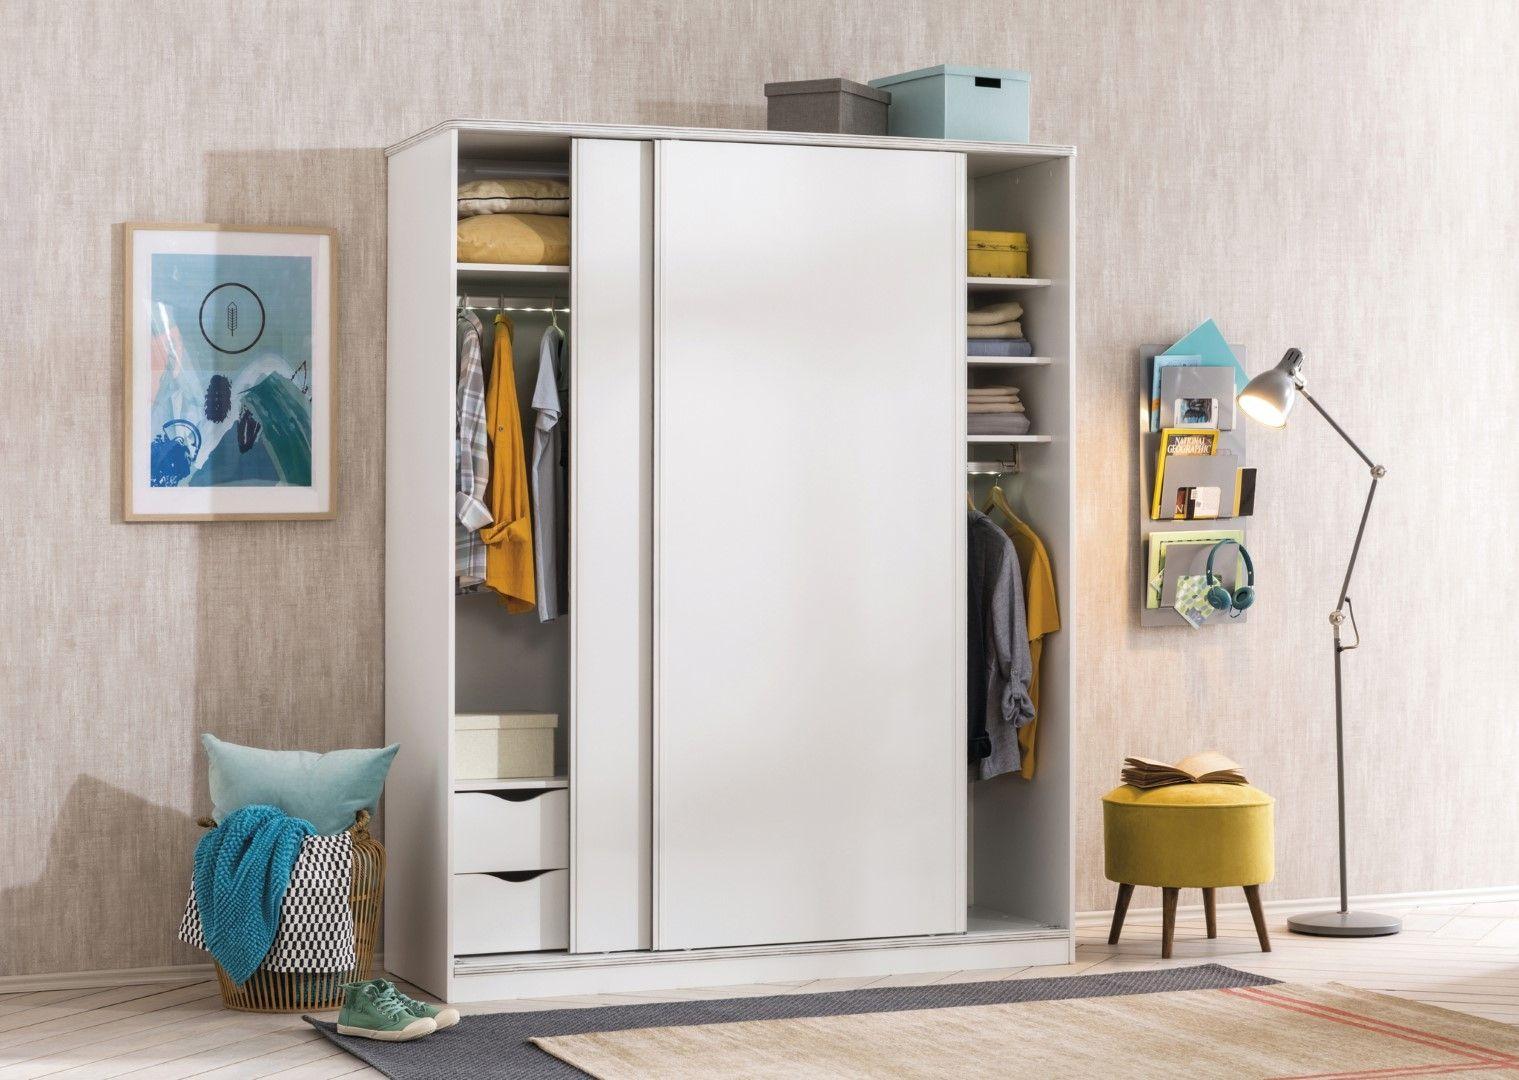 Witte Slaapkamer Inrichten : California witte slaapkamer kast witte slaapkamer kledingkast